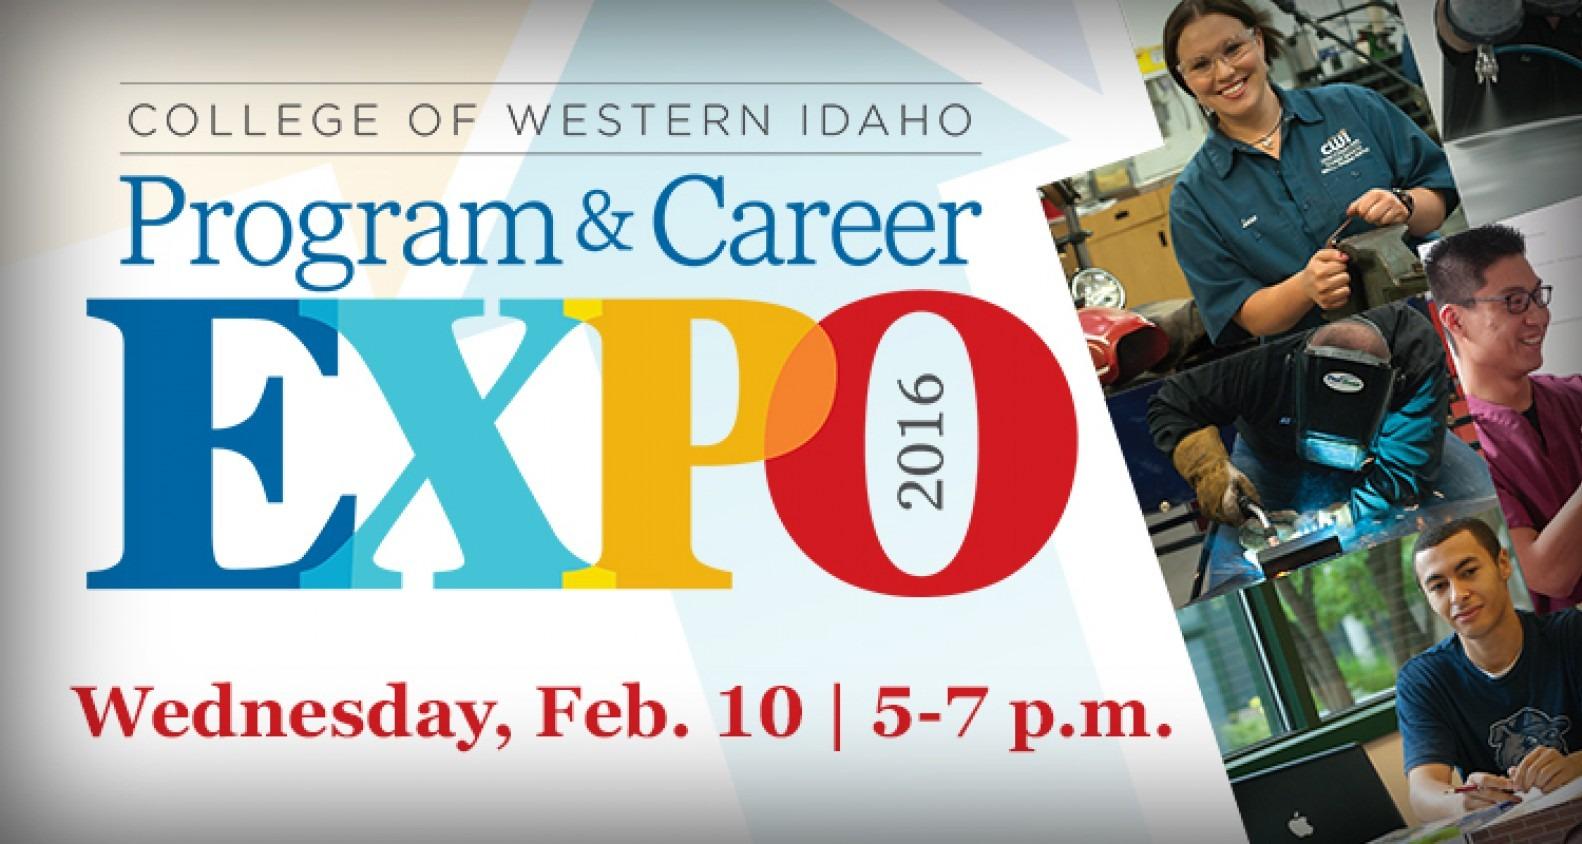 CWI Program & Career Expo | Wednesday, Feb. 10 | 5-7 p.m.